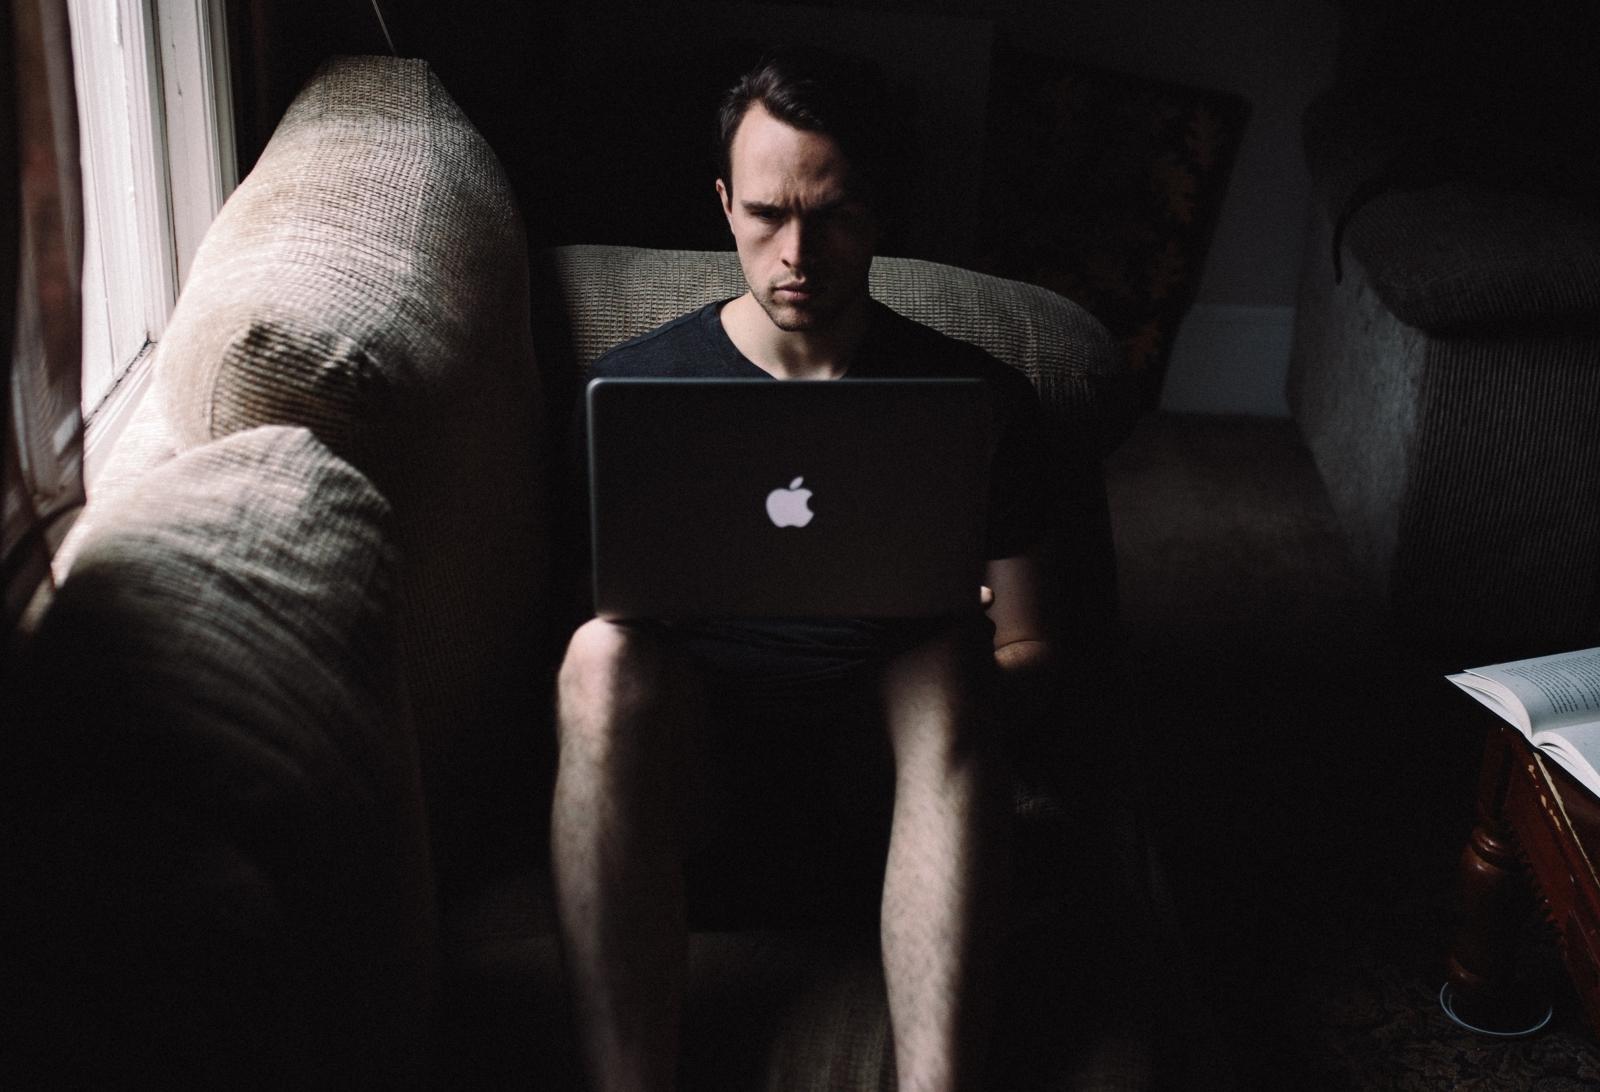 Man on a laptop in the dark